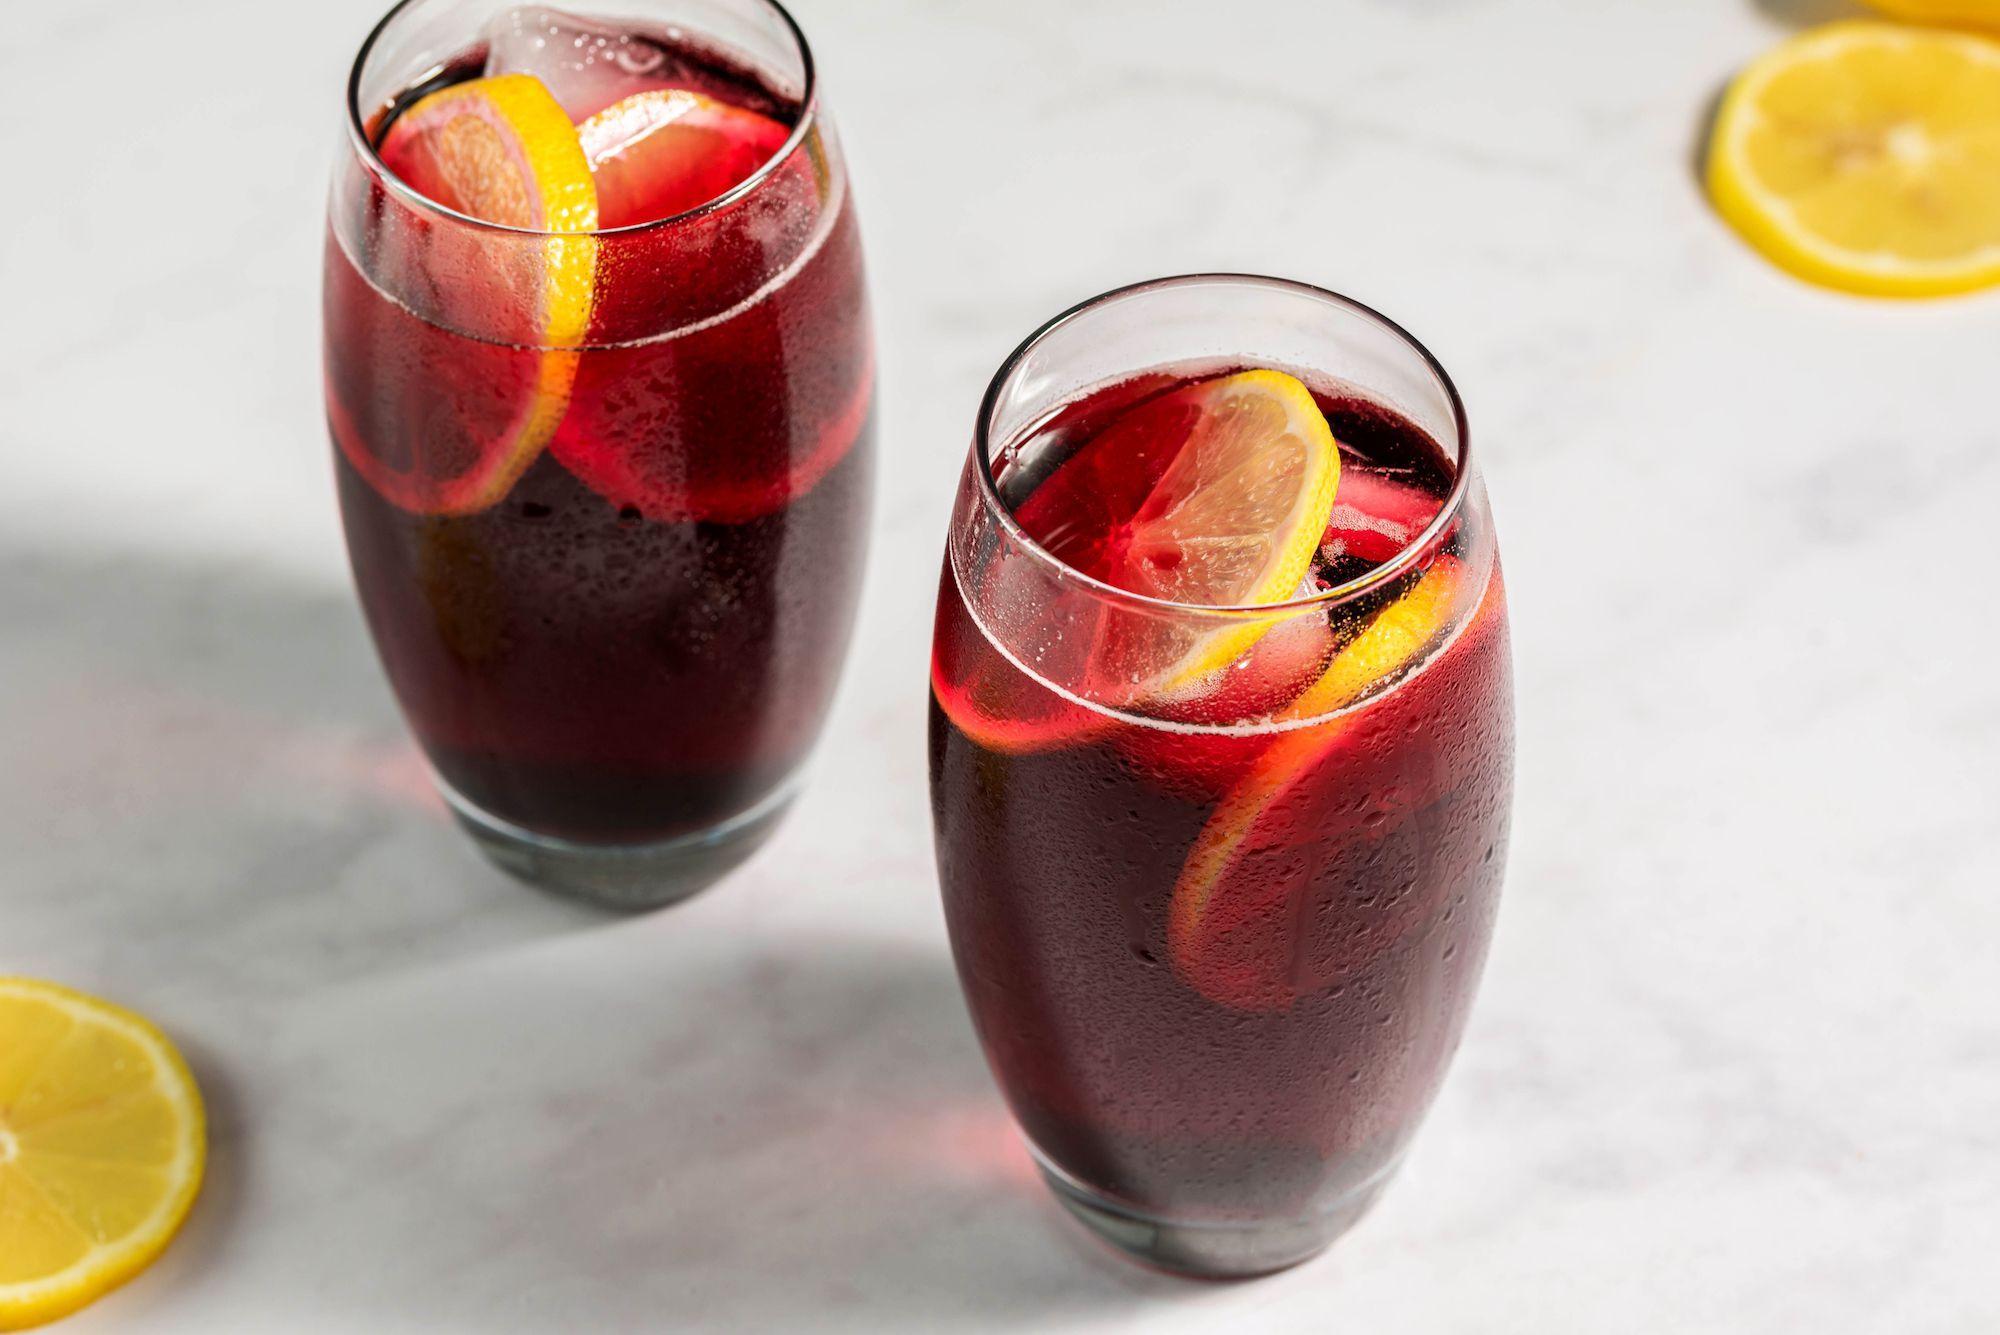 Make Tinto De Verano A Refreshing Spanish Wine Cocktail For Summer Recipe In 2020 Wine Recipes Muscadine Wine Spanish Wine